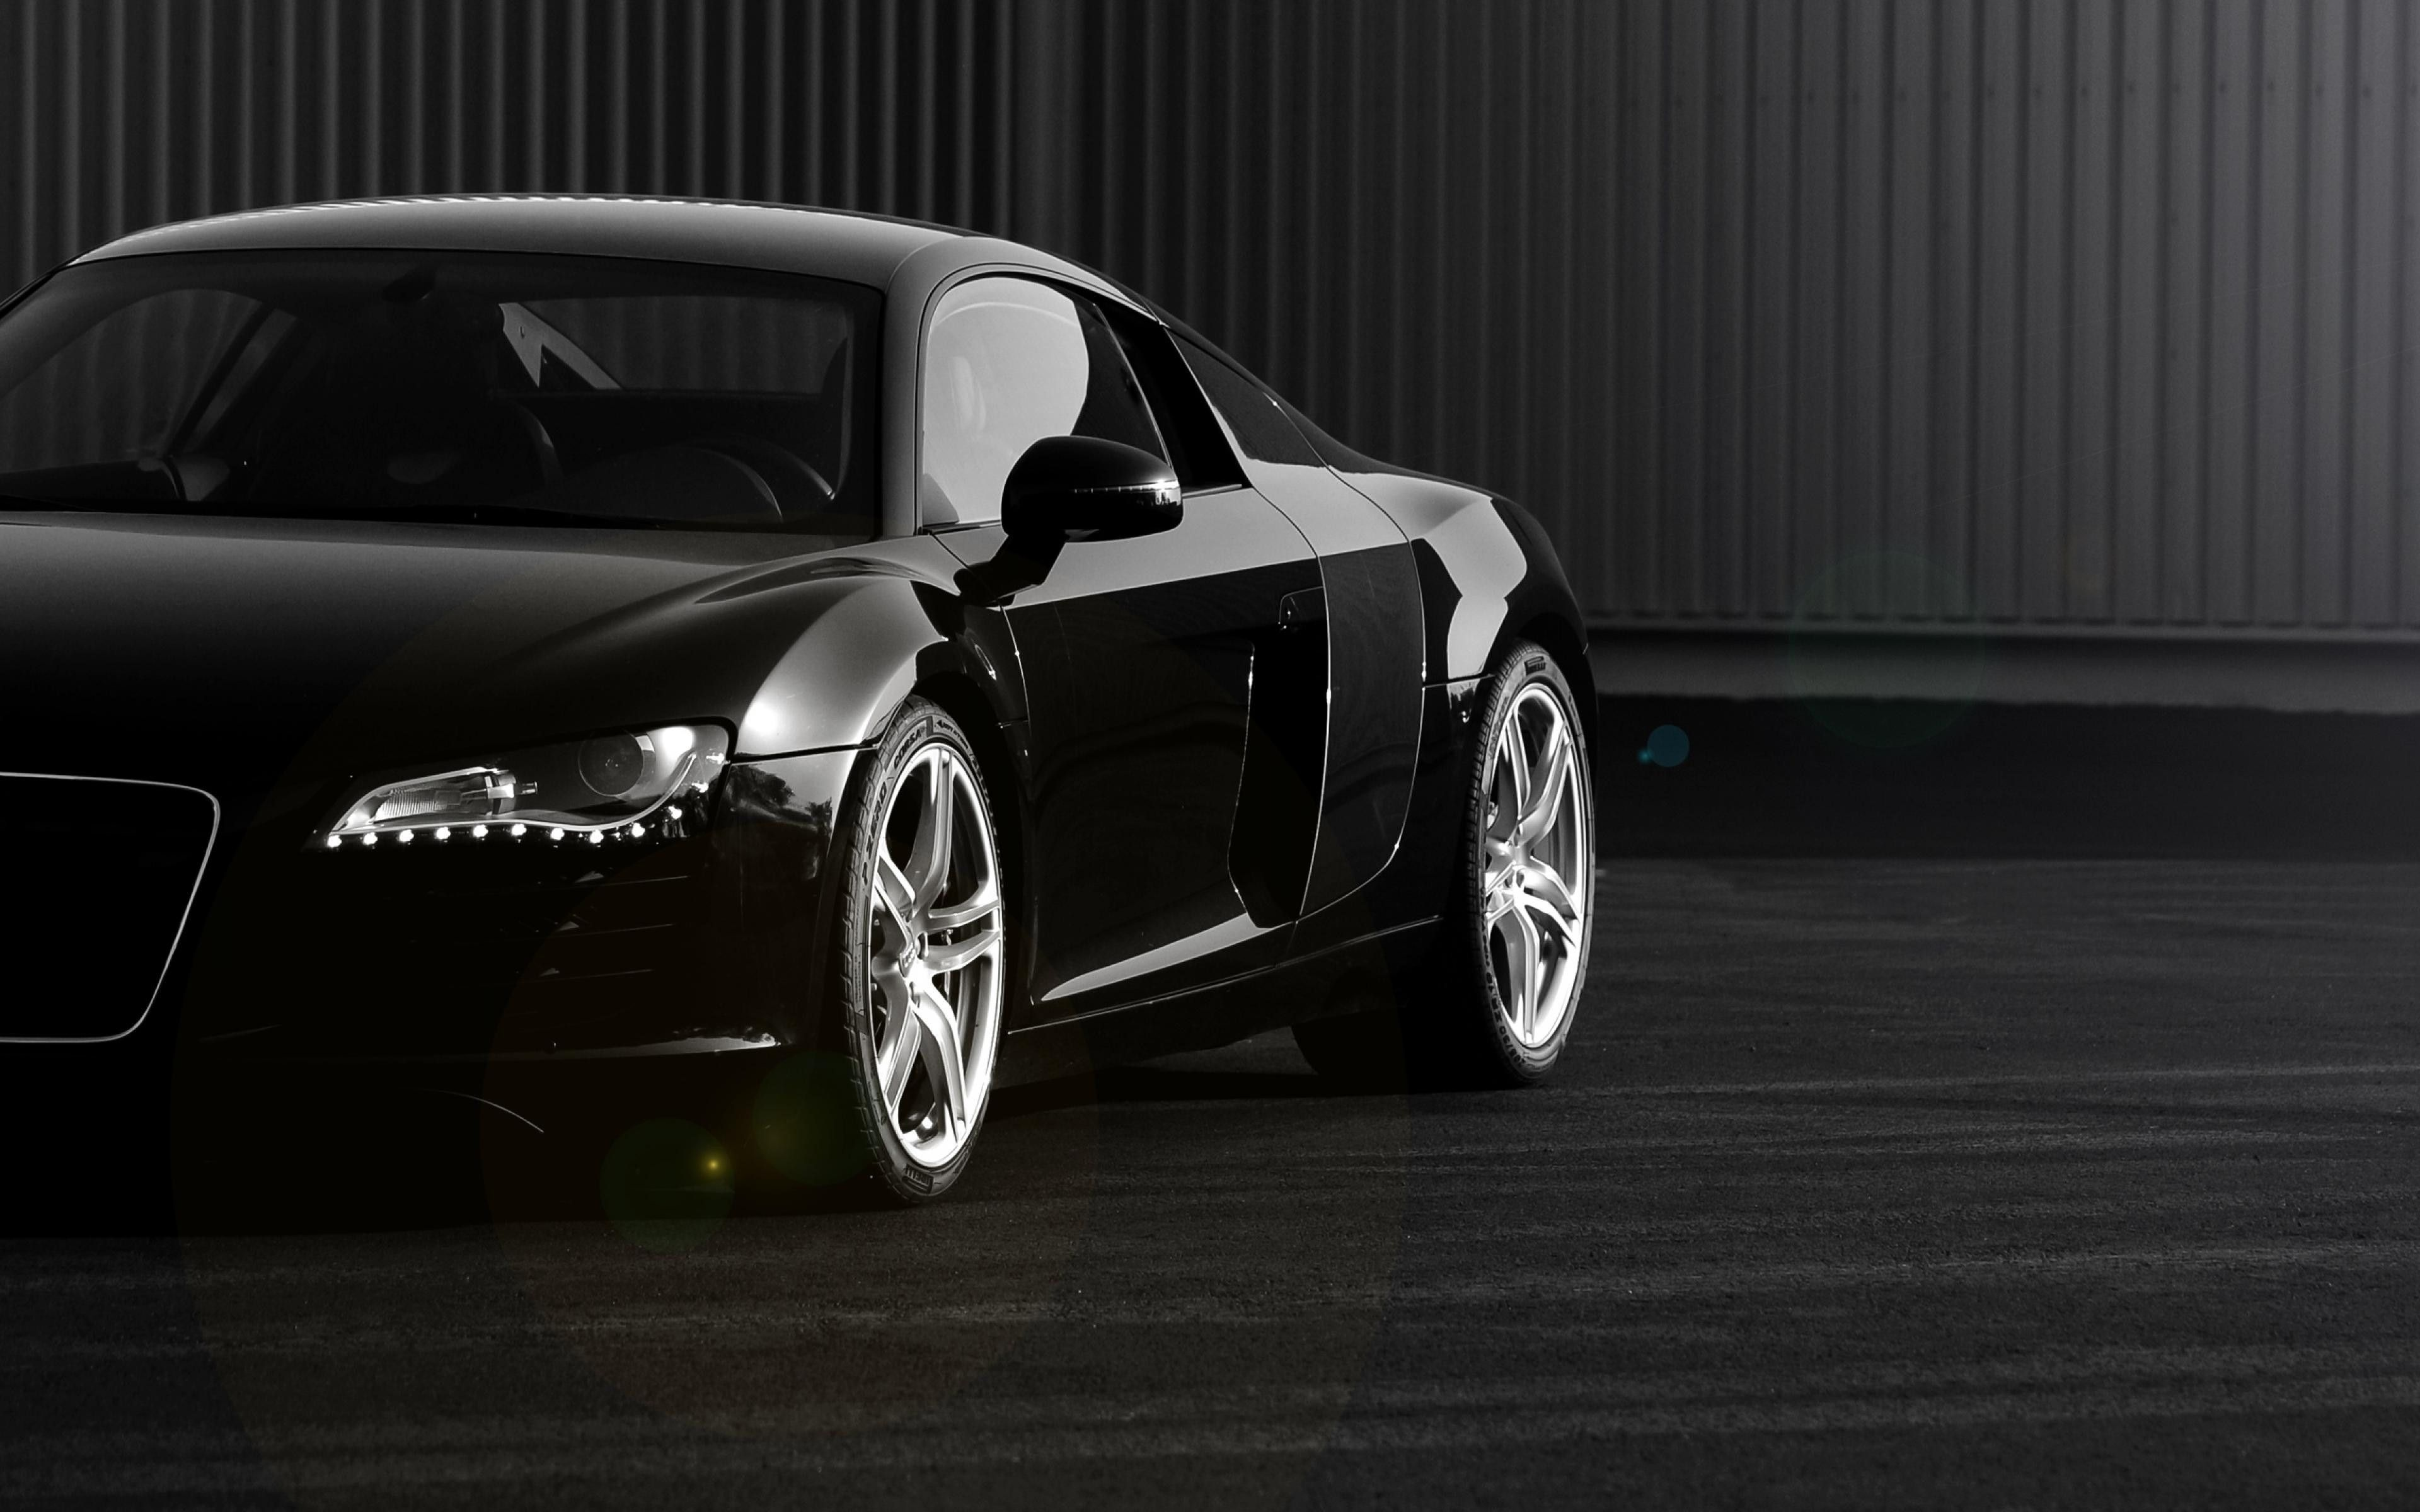 Audi Car Wallpapers Top Free Audi Car Backgrounds Wallpaperaccess